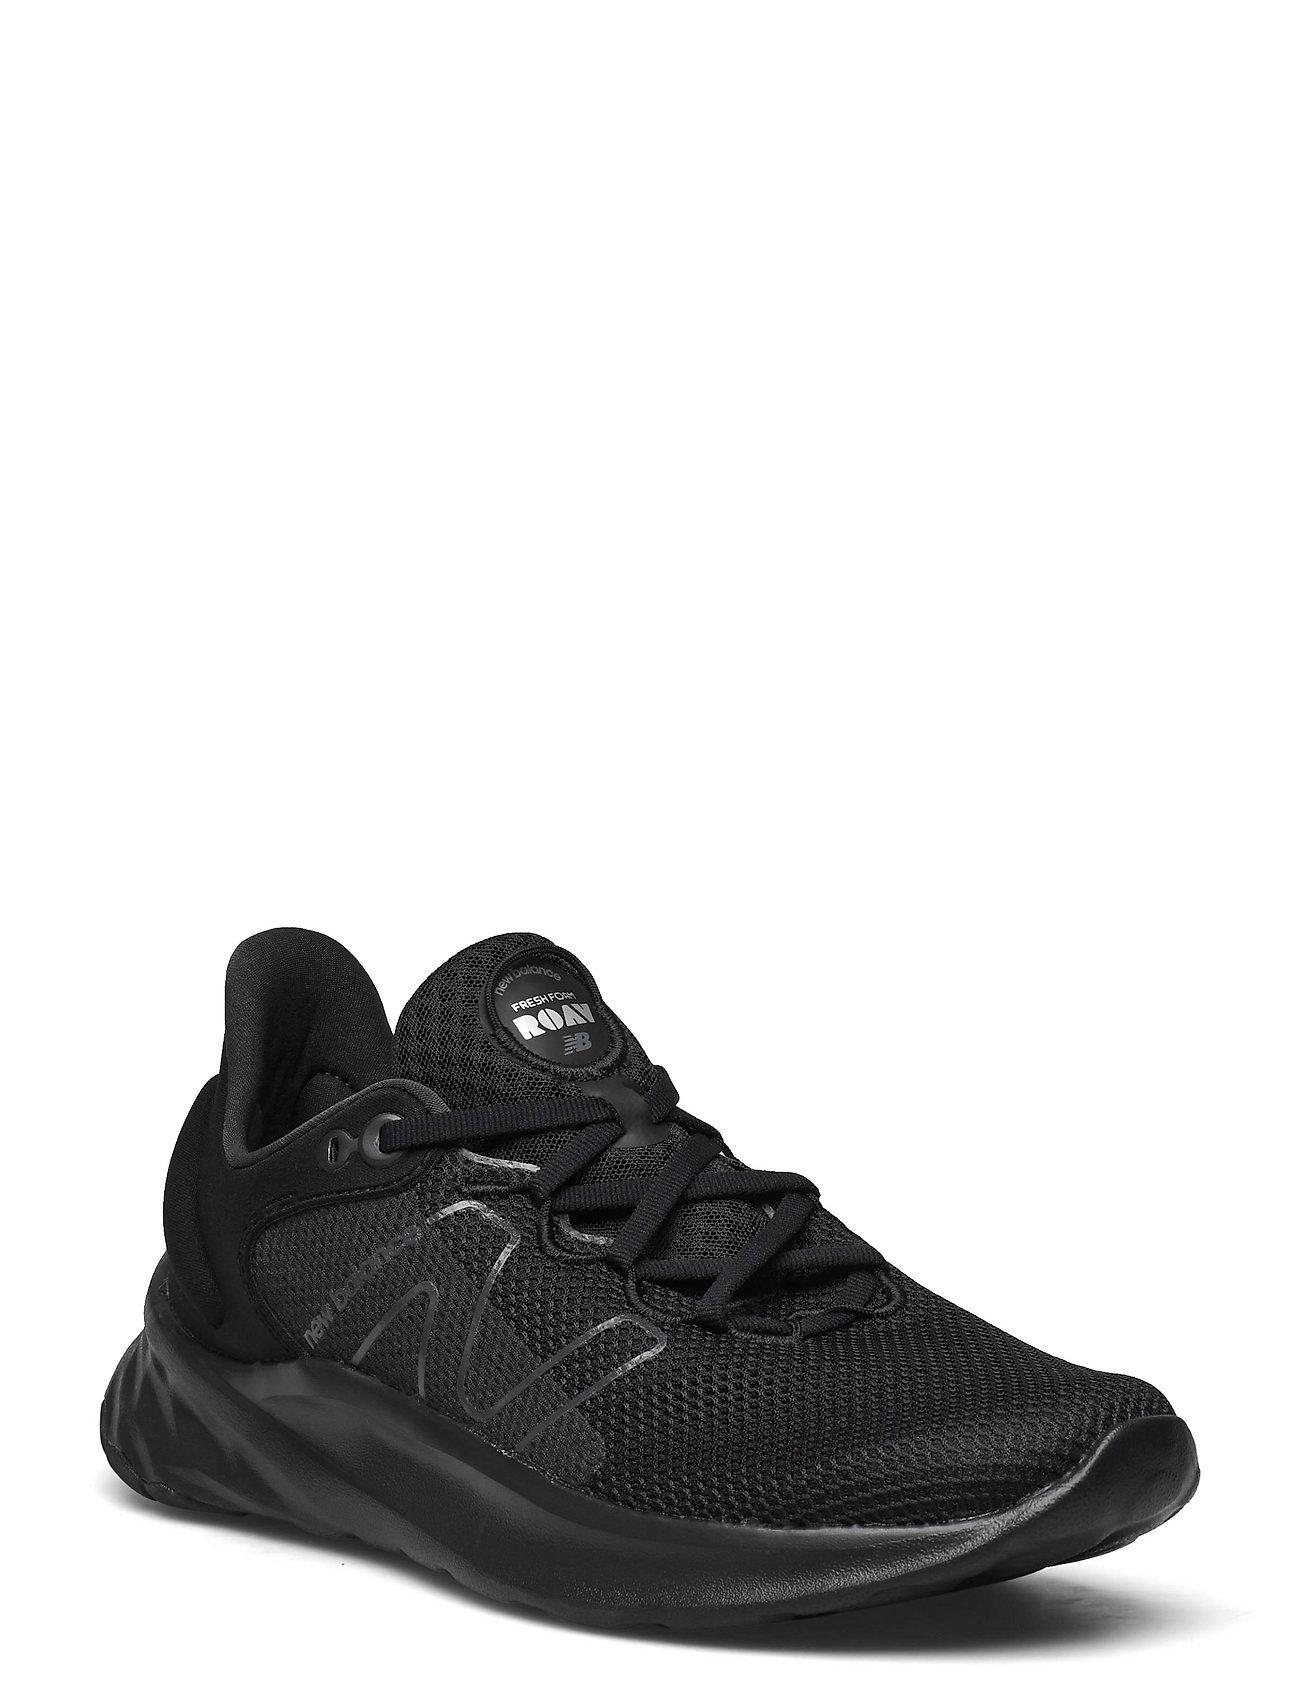 Mroavsk2 Shoes Sport Shoes Running Shoes Sort New Balance